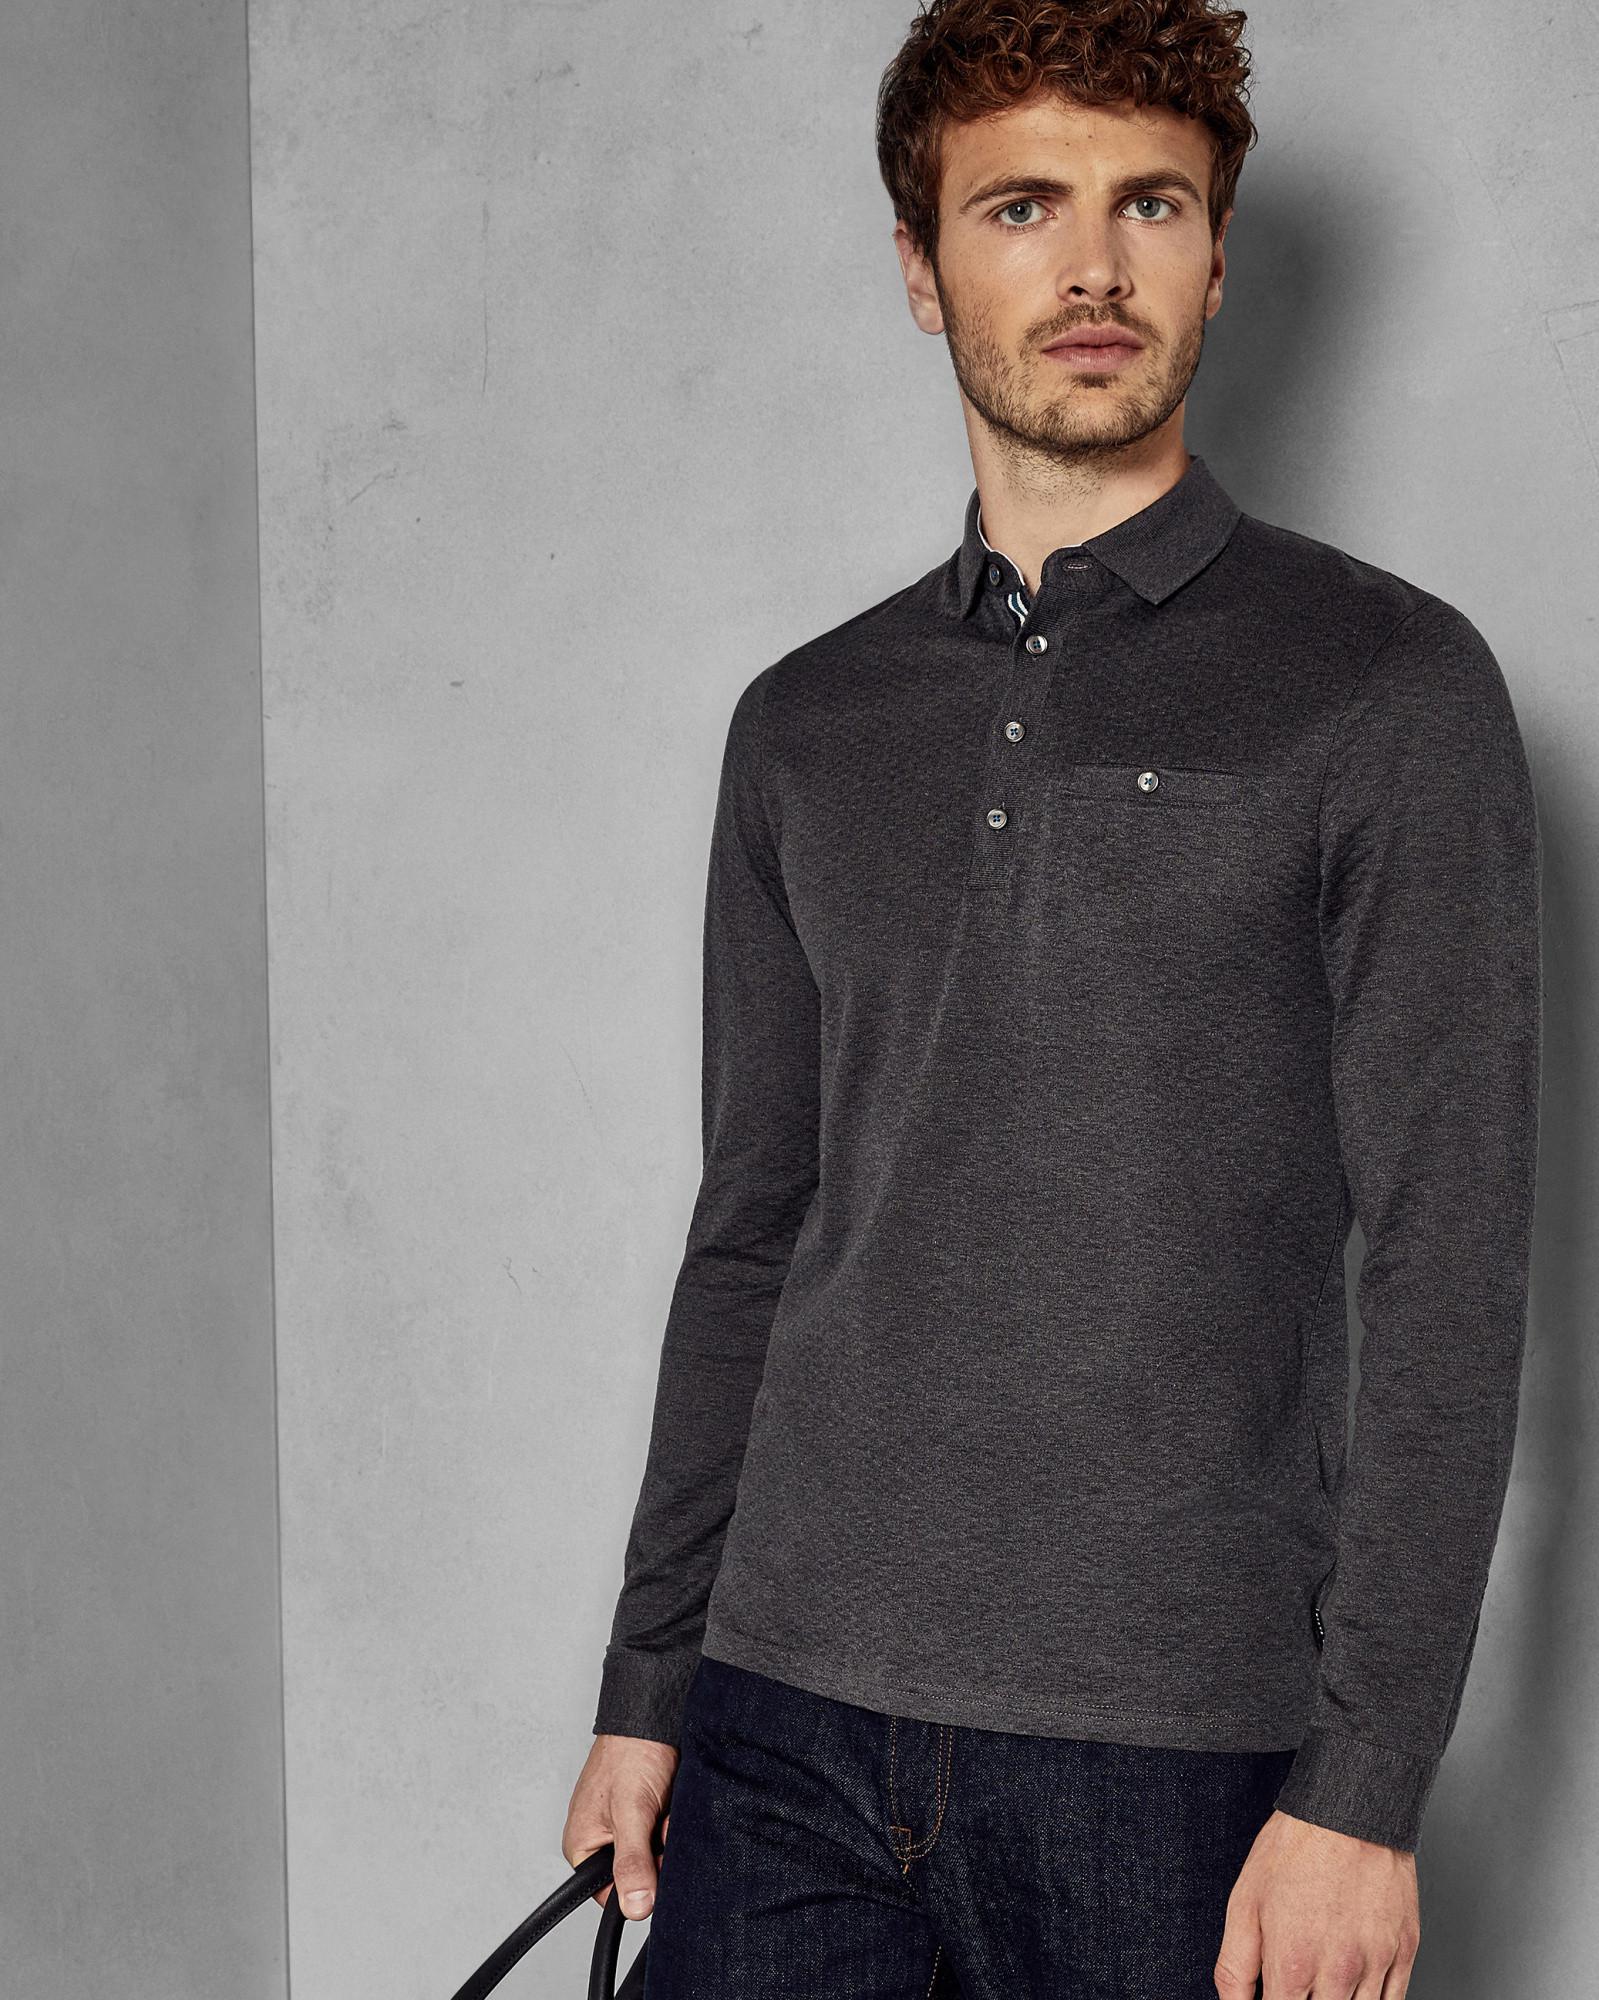 85792ed2e38fee Lyst - Ted Baker Long Sleeved Cotton Polo Shirt in Gray for Men